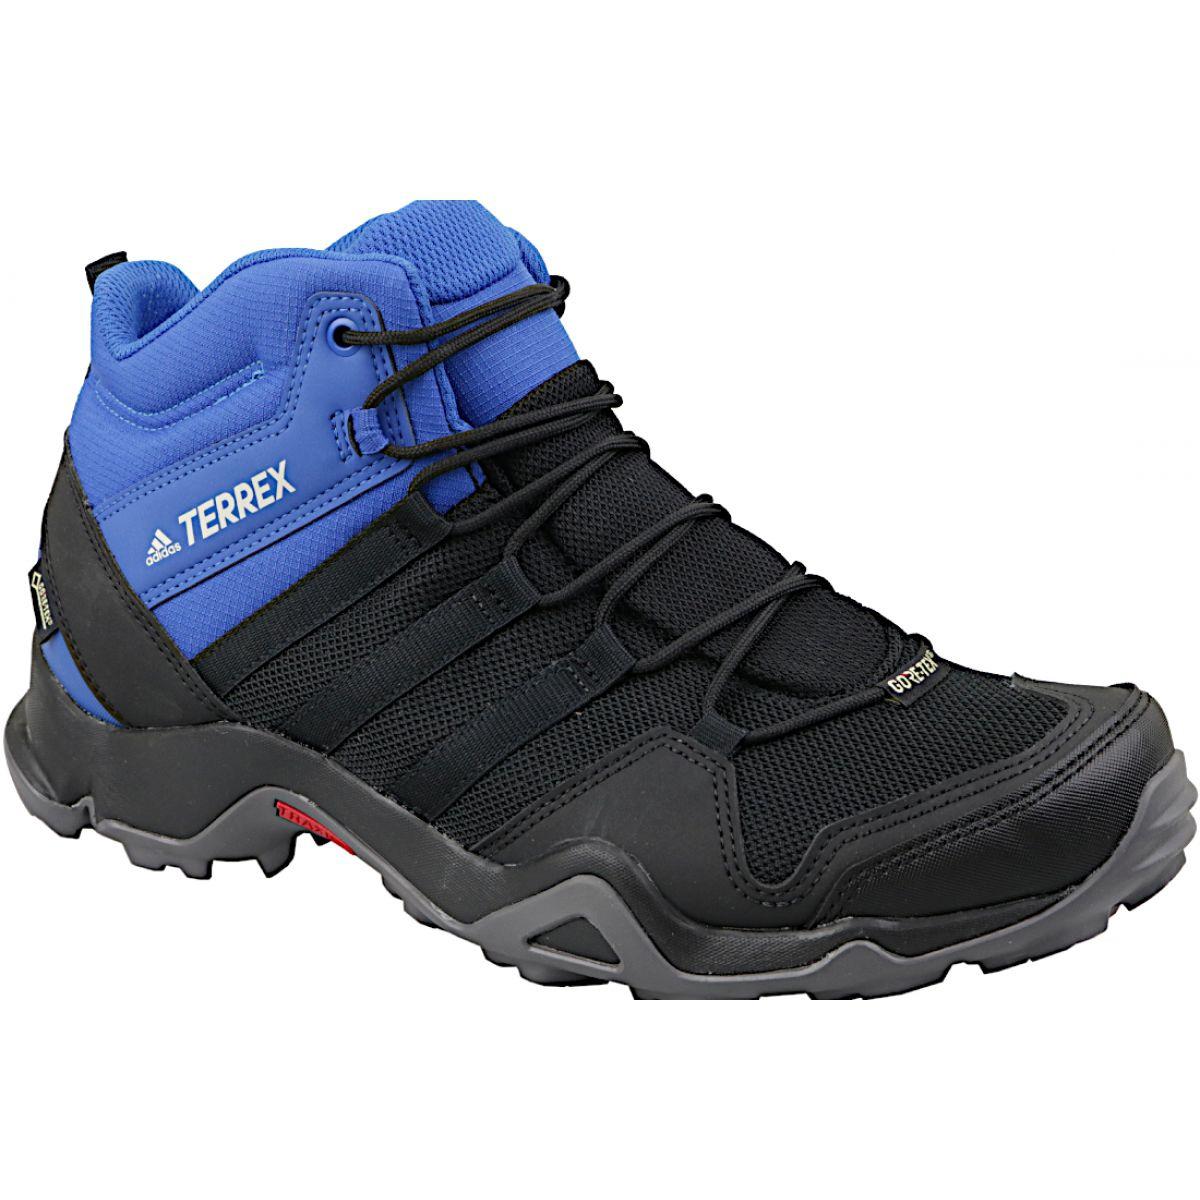 Details about Adidas Terrex AX2R Mid Gtx M AC8035 shoes